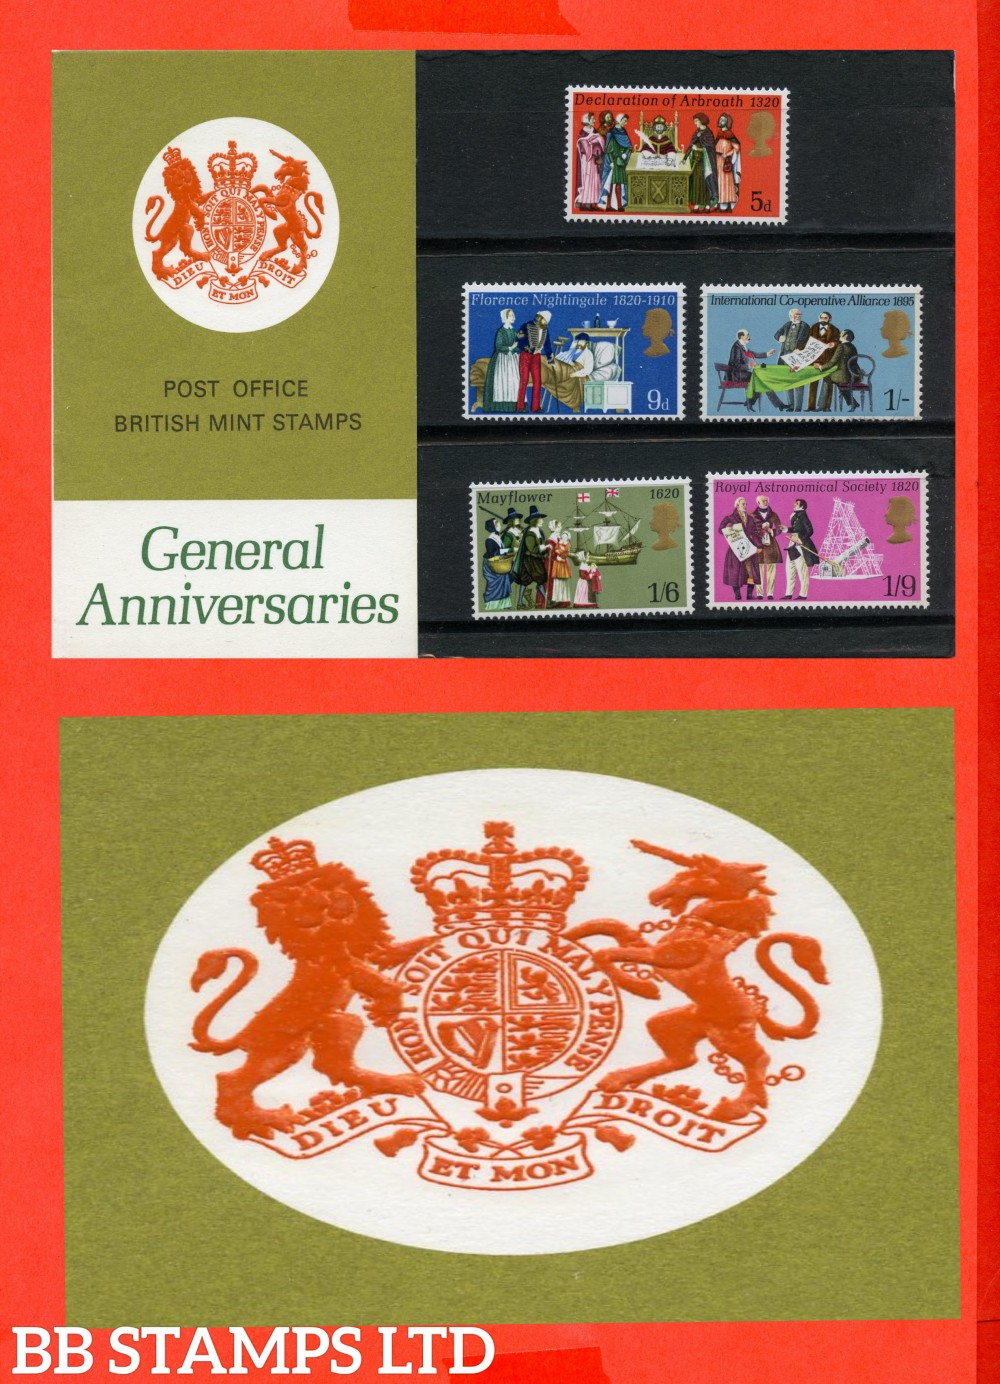 1970 General Anniversaries Pres Pack. Type E = Chain Visible, Marjorie Spelt Correct, Descendants Spelt Correct.